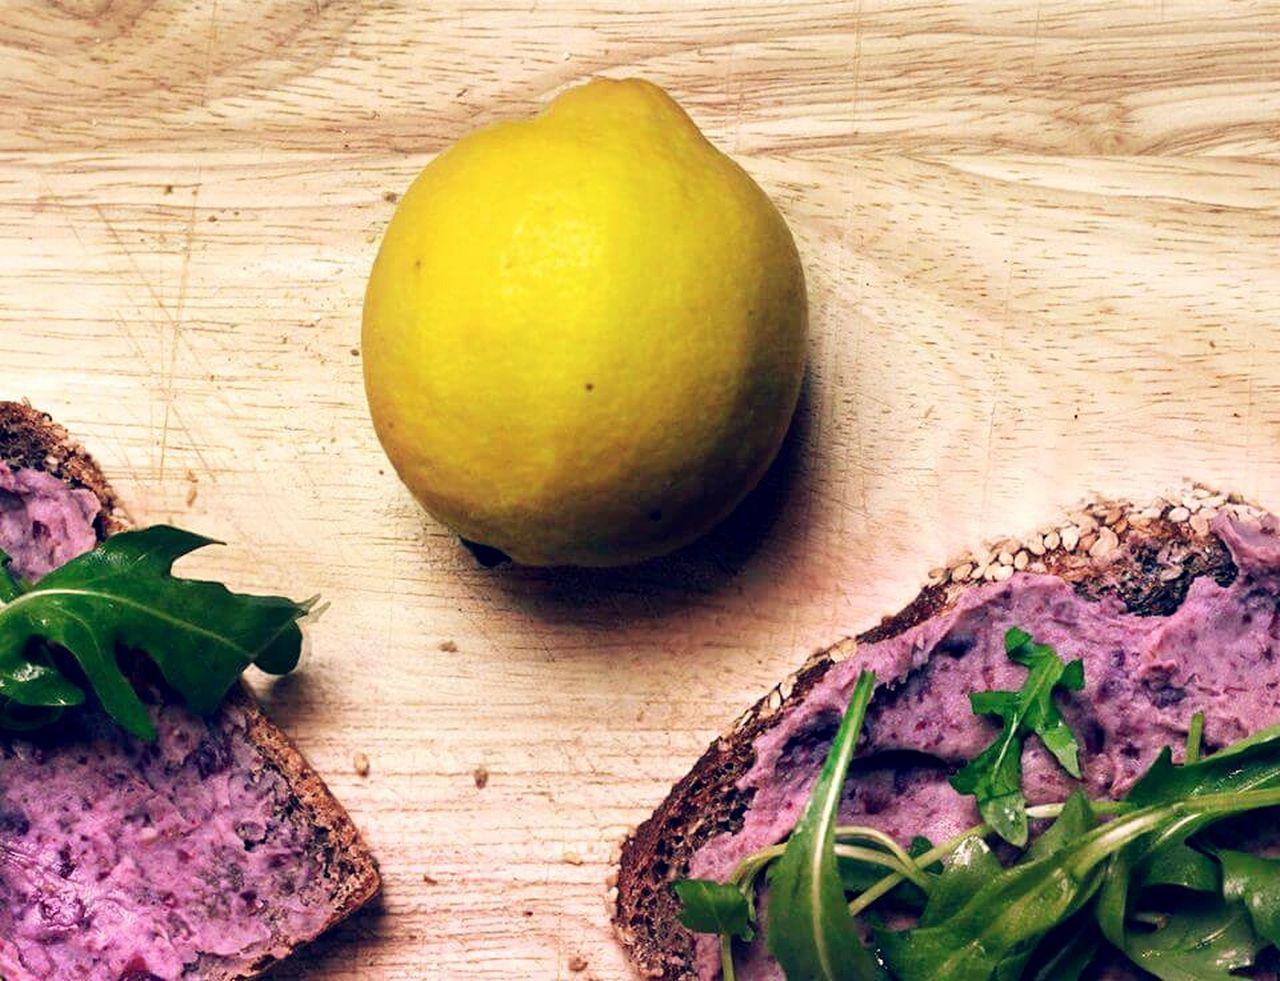 Foodphotography Lemon Sandwiches Mäckish Color Cafe Neue Heimat